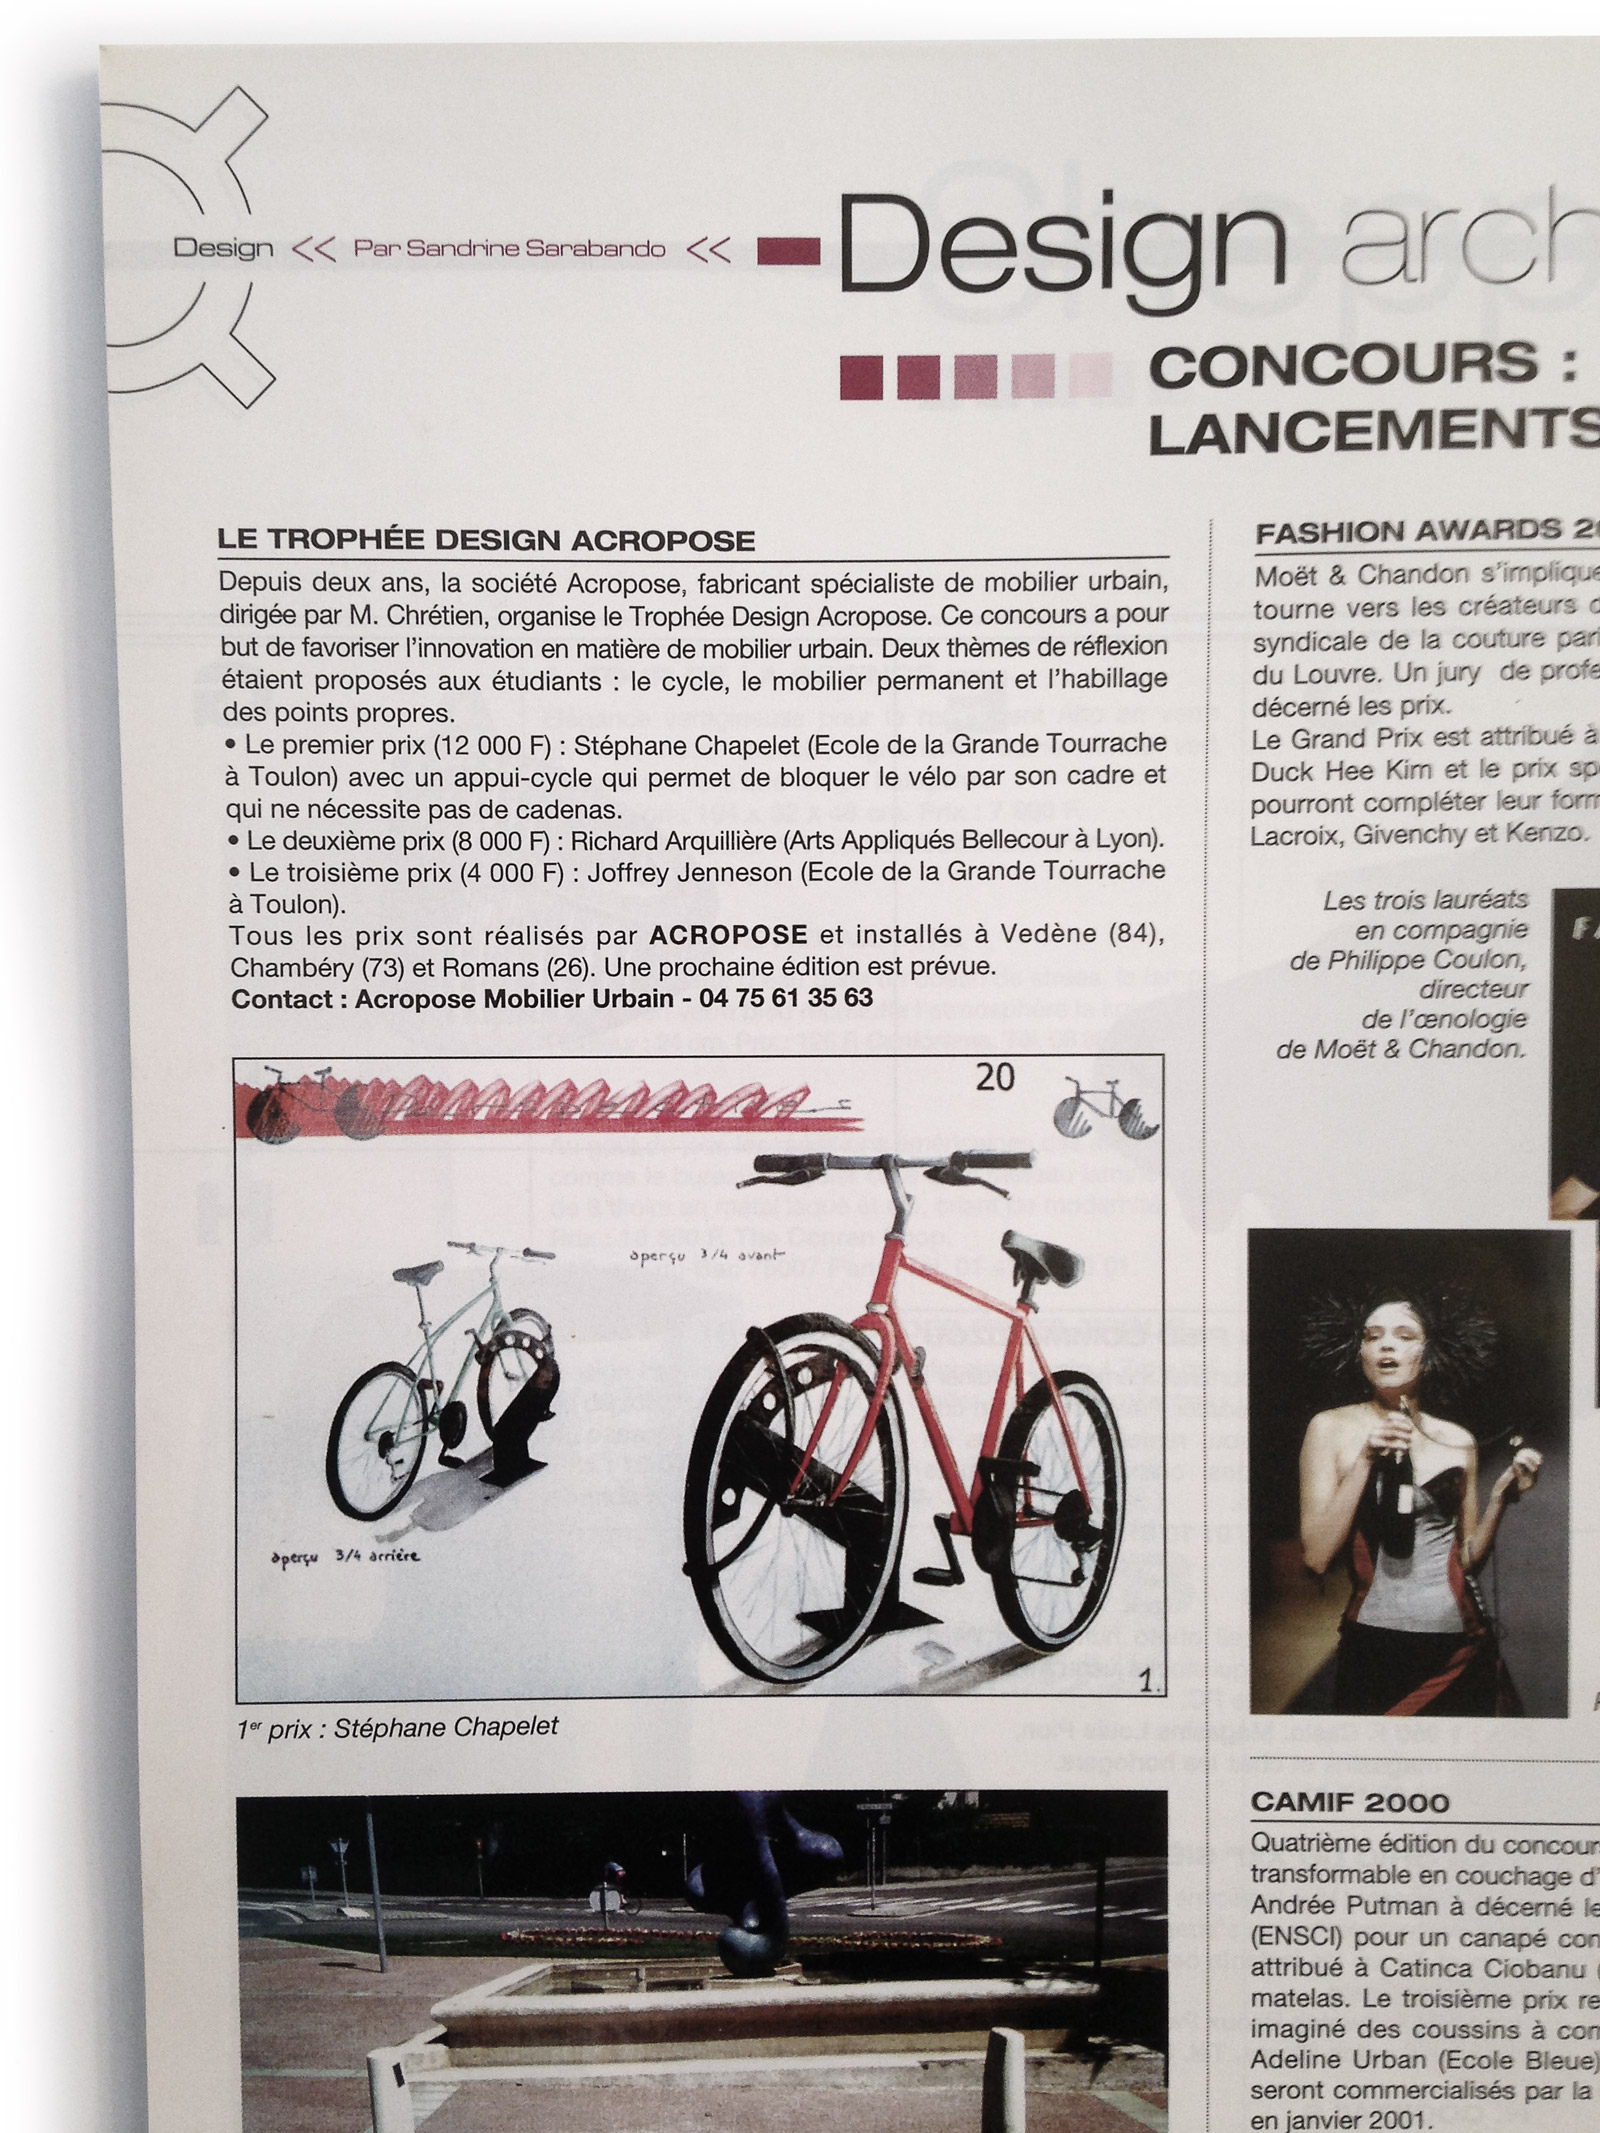 press-design-Archi-design-page-2.jpg